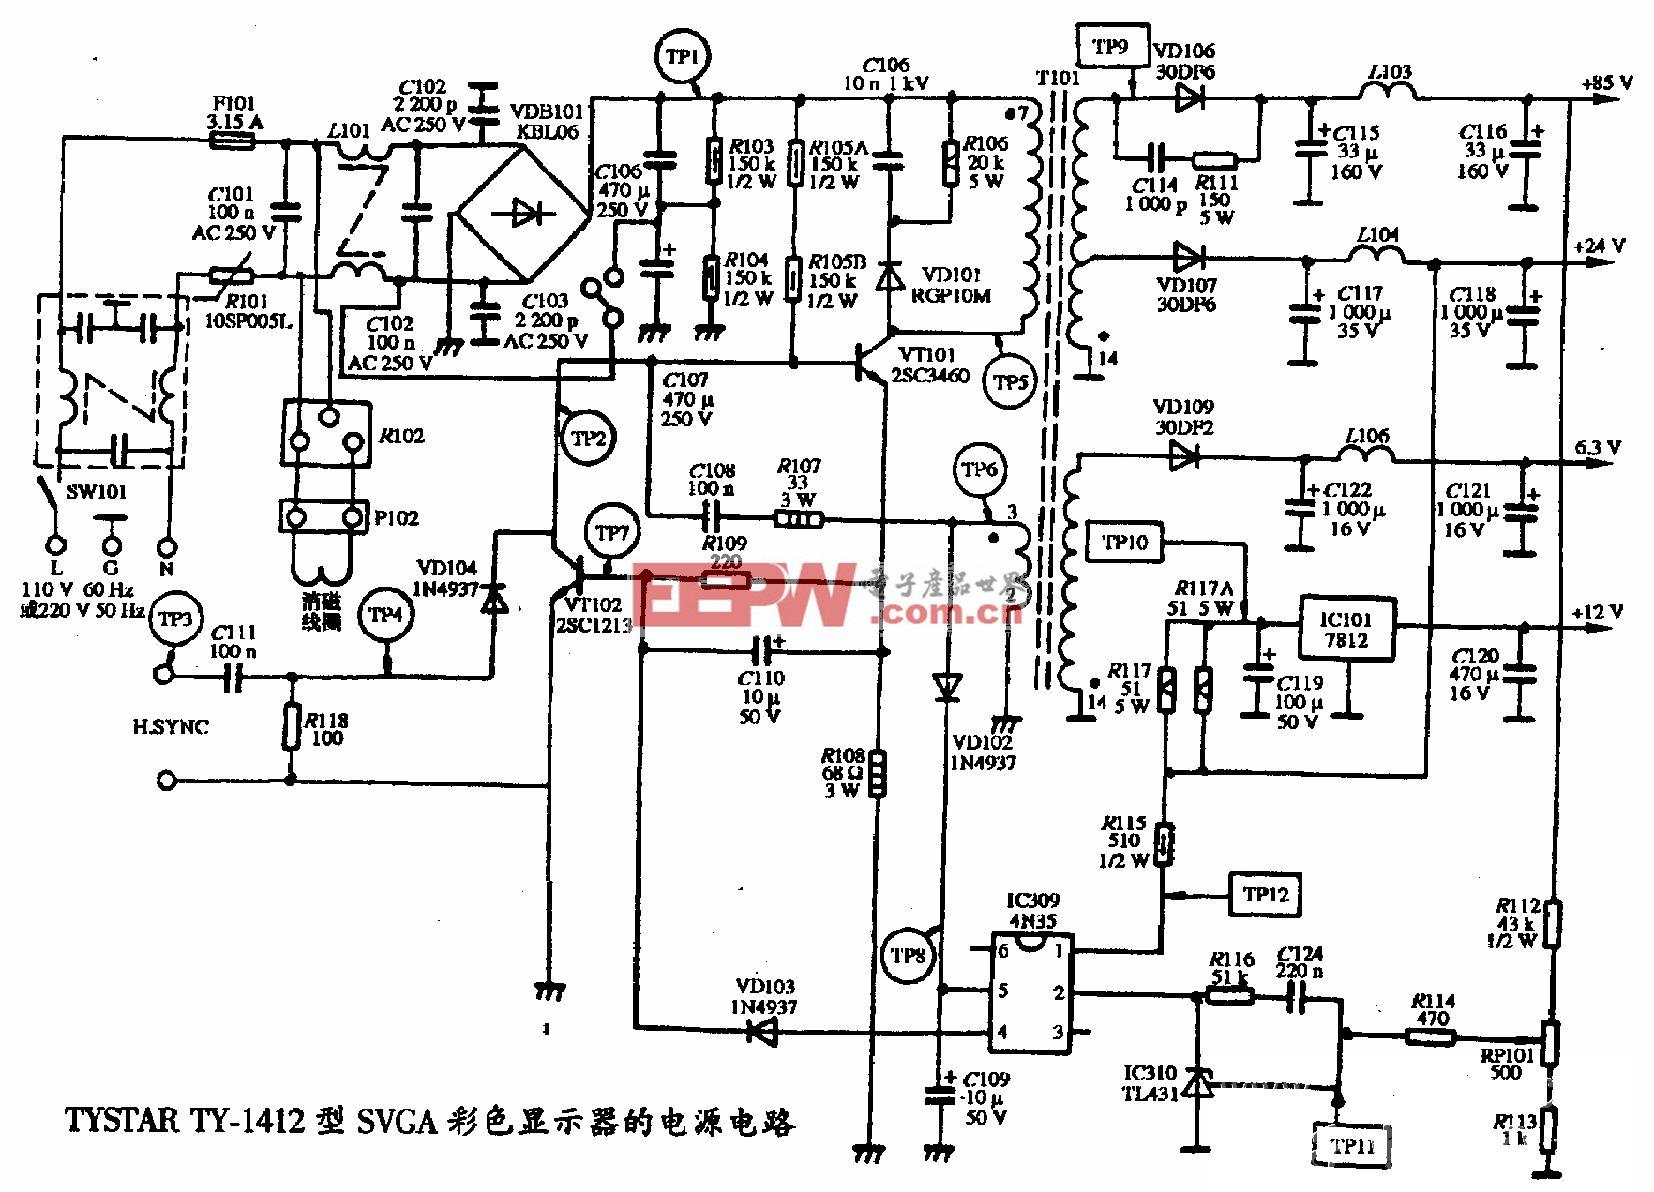 TYSTAR TY-1412型SVGA彩色显示器的电源电路图